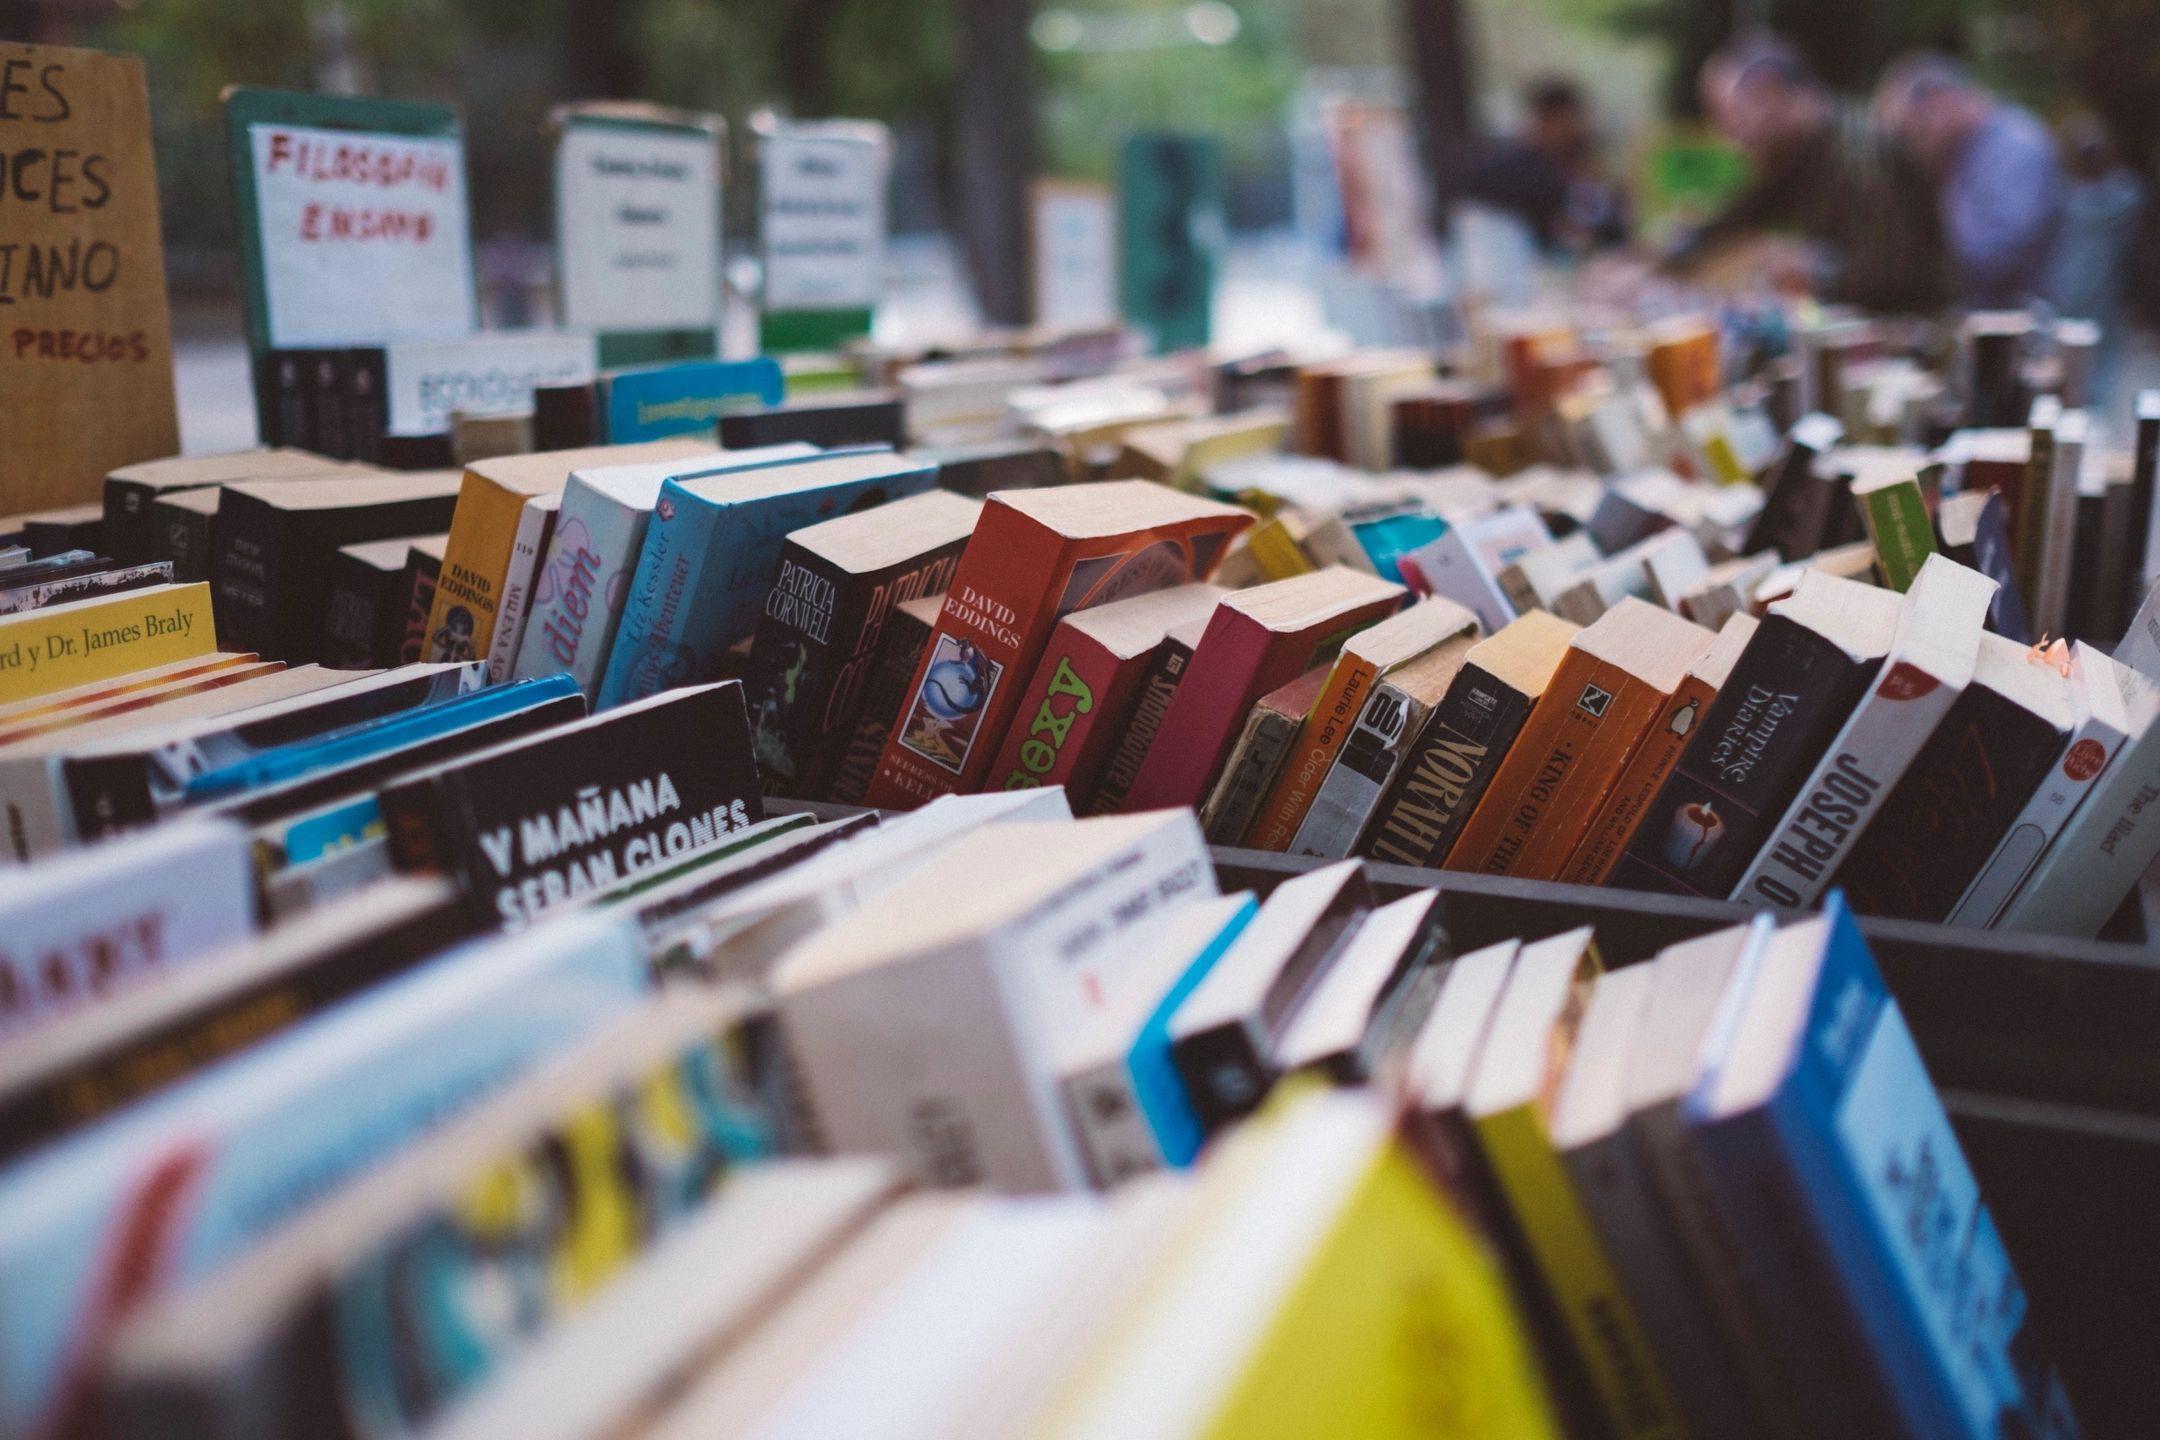 Top 5 VueJS Books you should Read